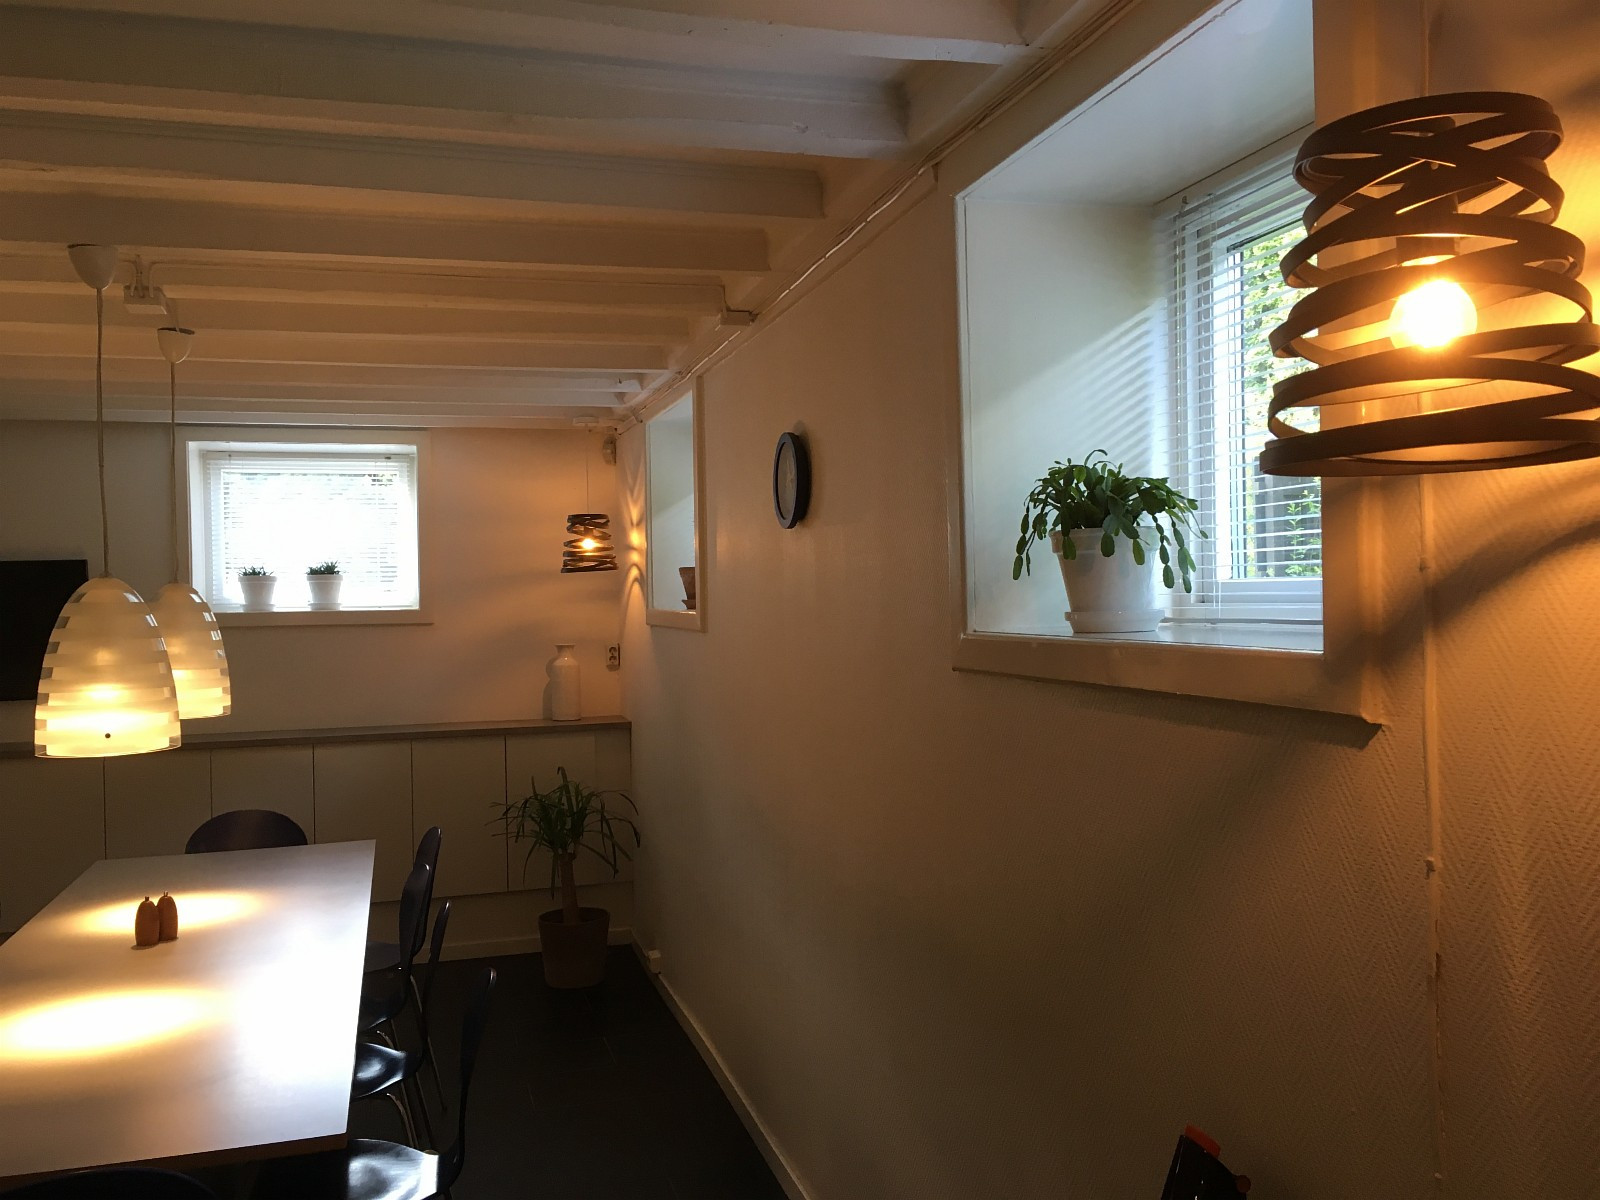 Lampefeber; 1 stk Curl my light pendel designerlampe | FINN.no